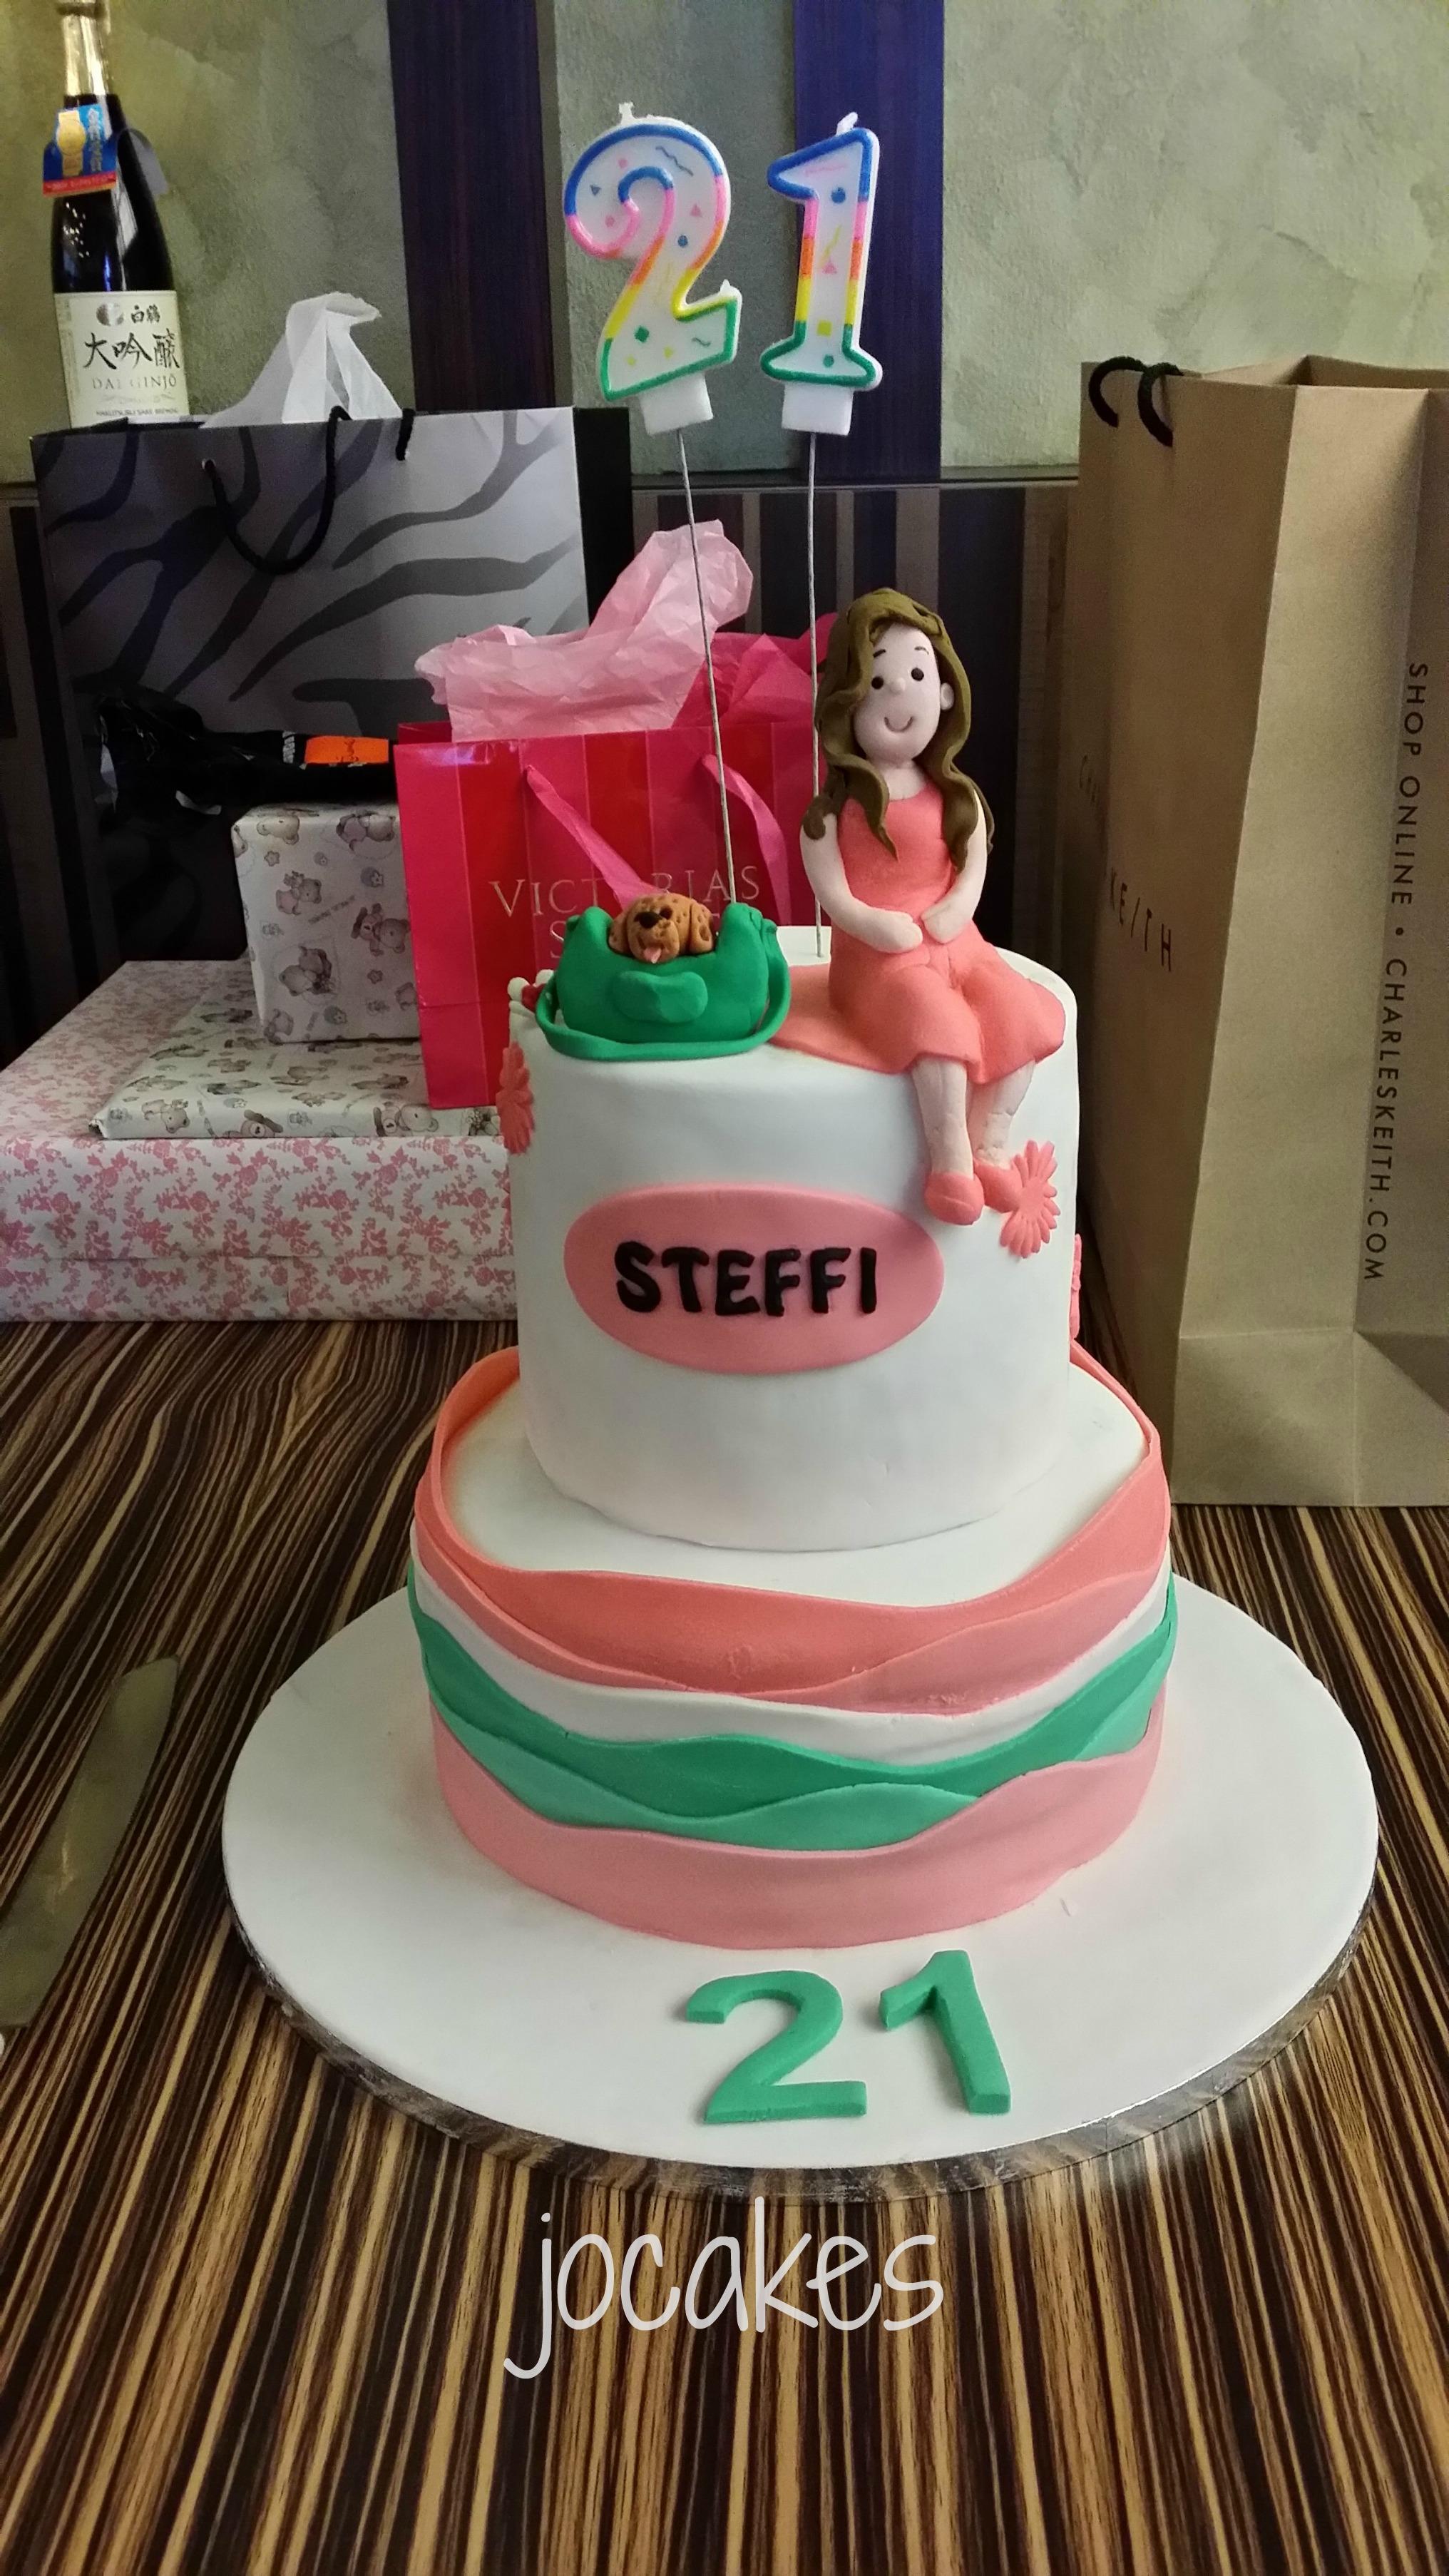 Steffi S 21st Birthday Jocakes